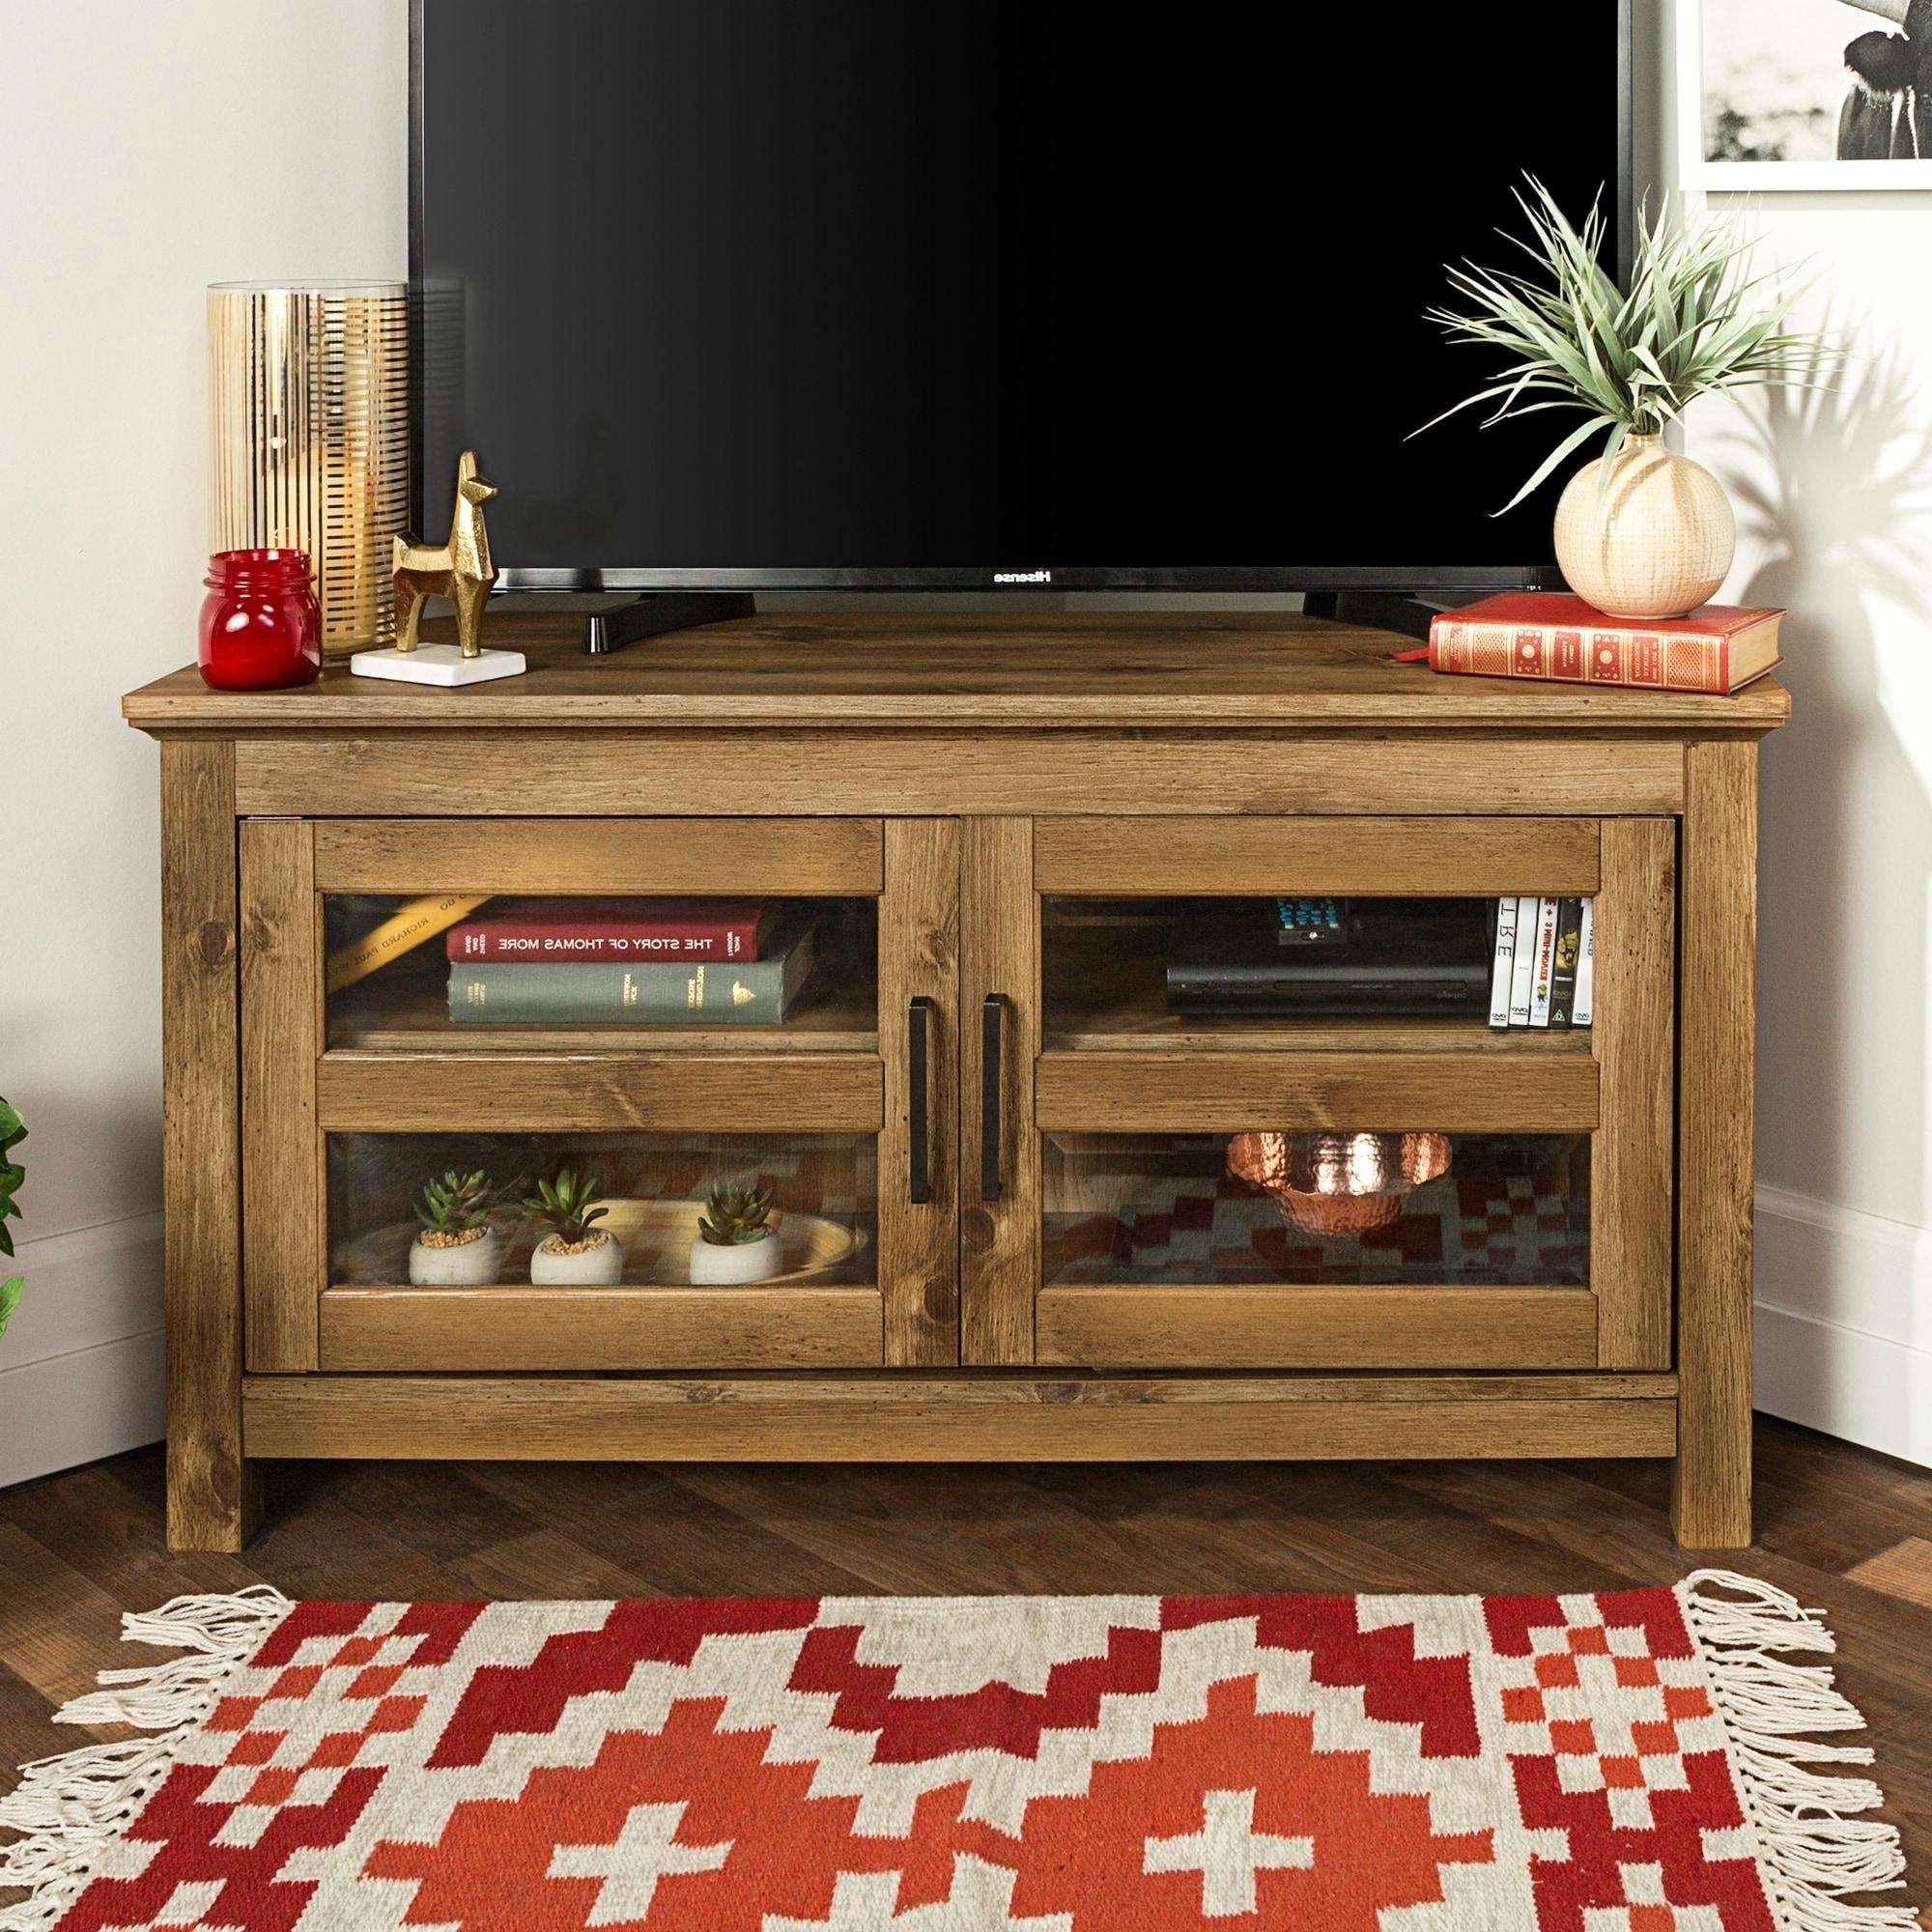 Middlebrook Designs Bow Valley 44 Inch Barnwood Corner Tv Throughout Priya Corner Tv Stands (View 7 of 20)